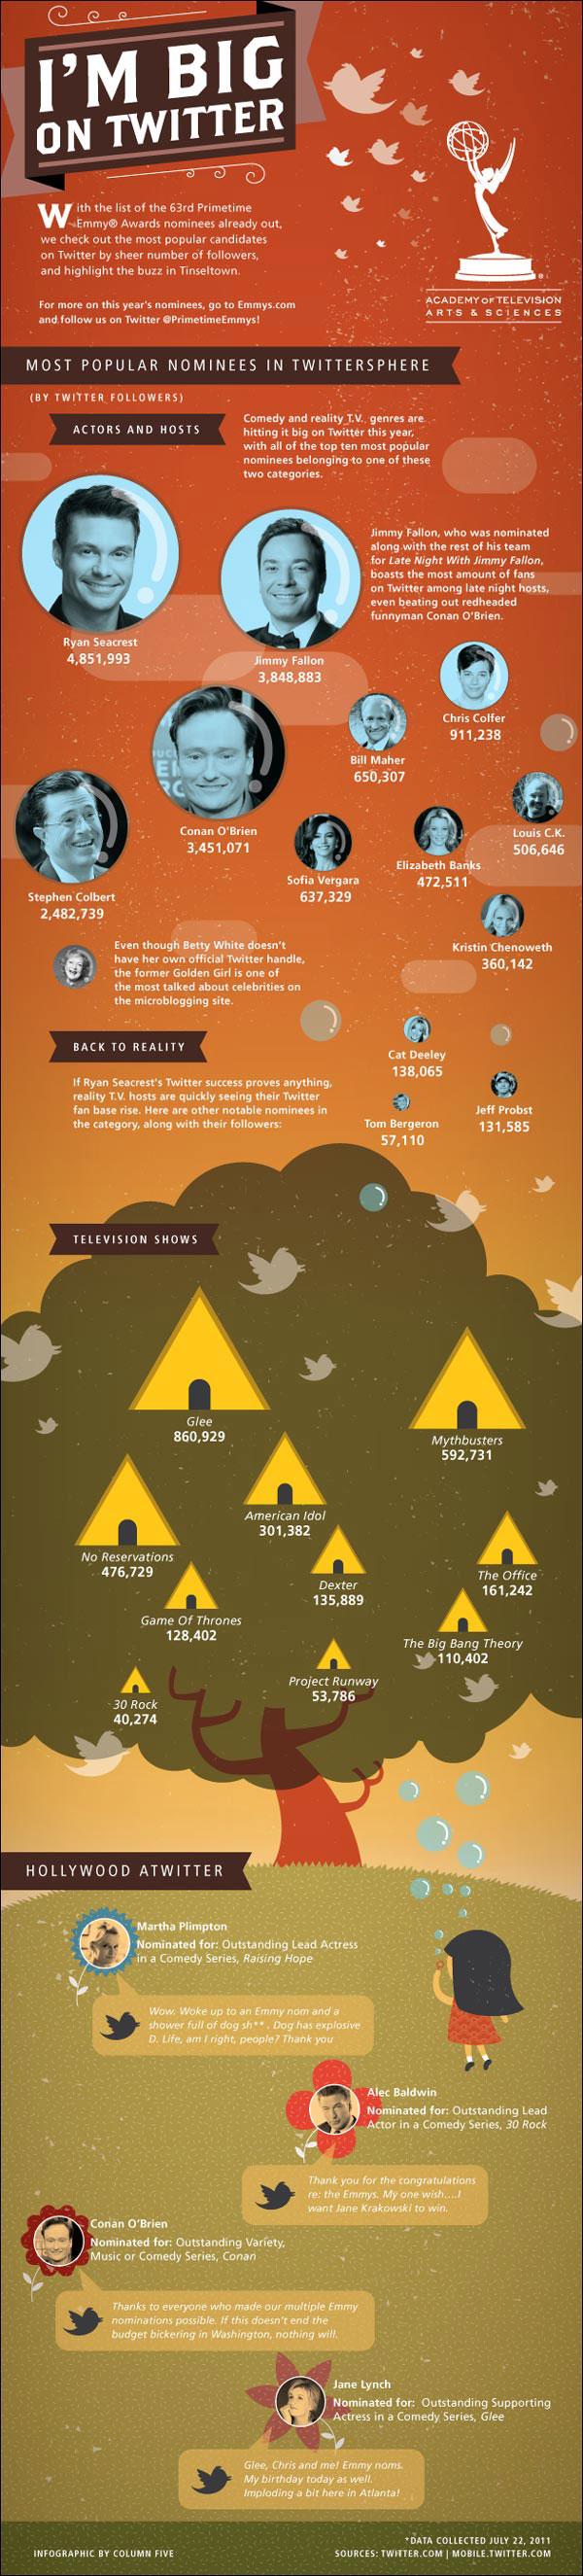 Infographic: I'm Big On Twitter